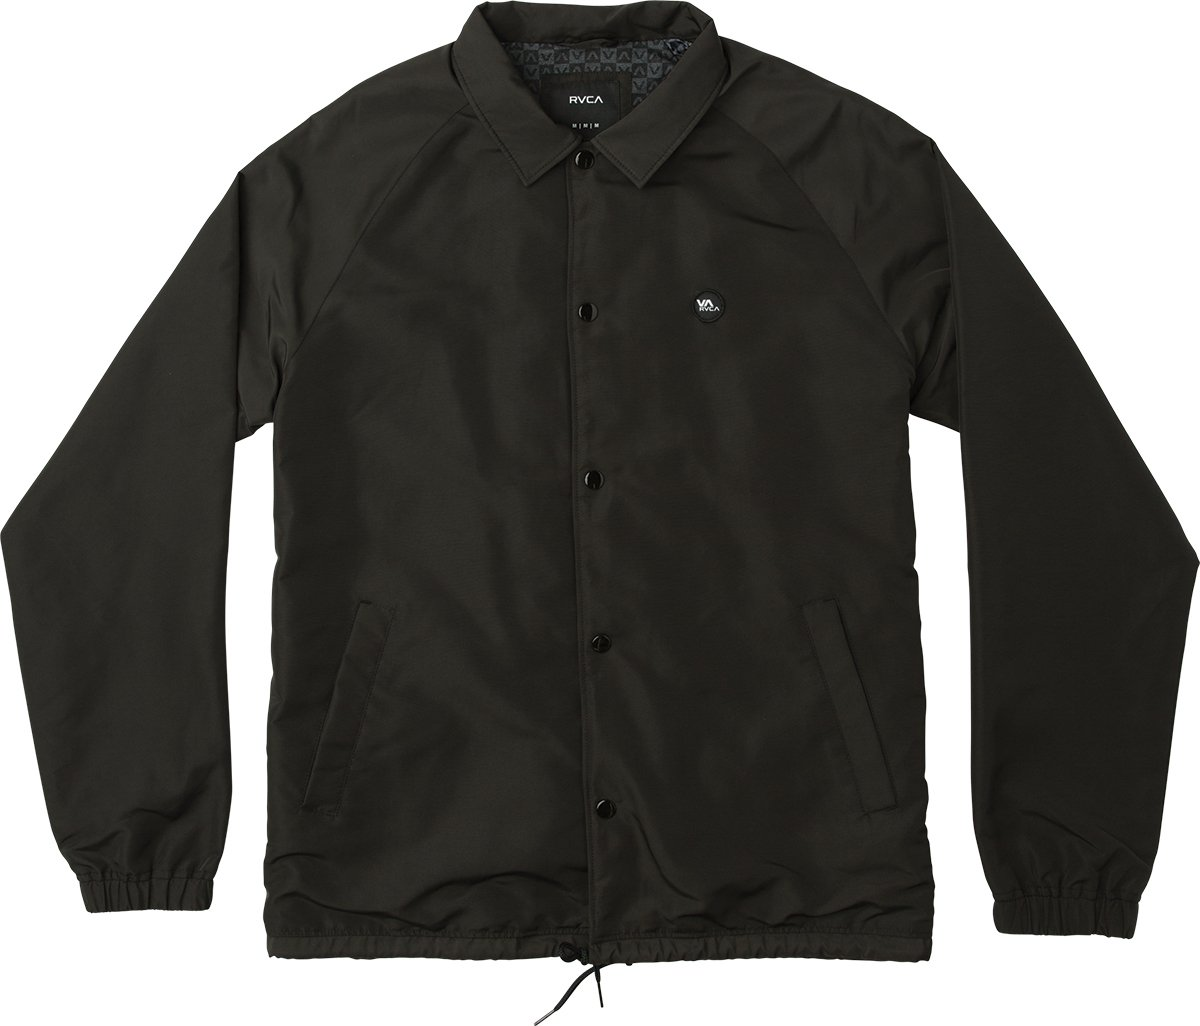 RVCA Men's ATW II Coaches Jacket, Black, M